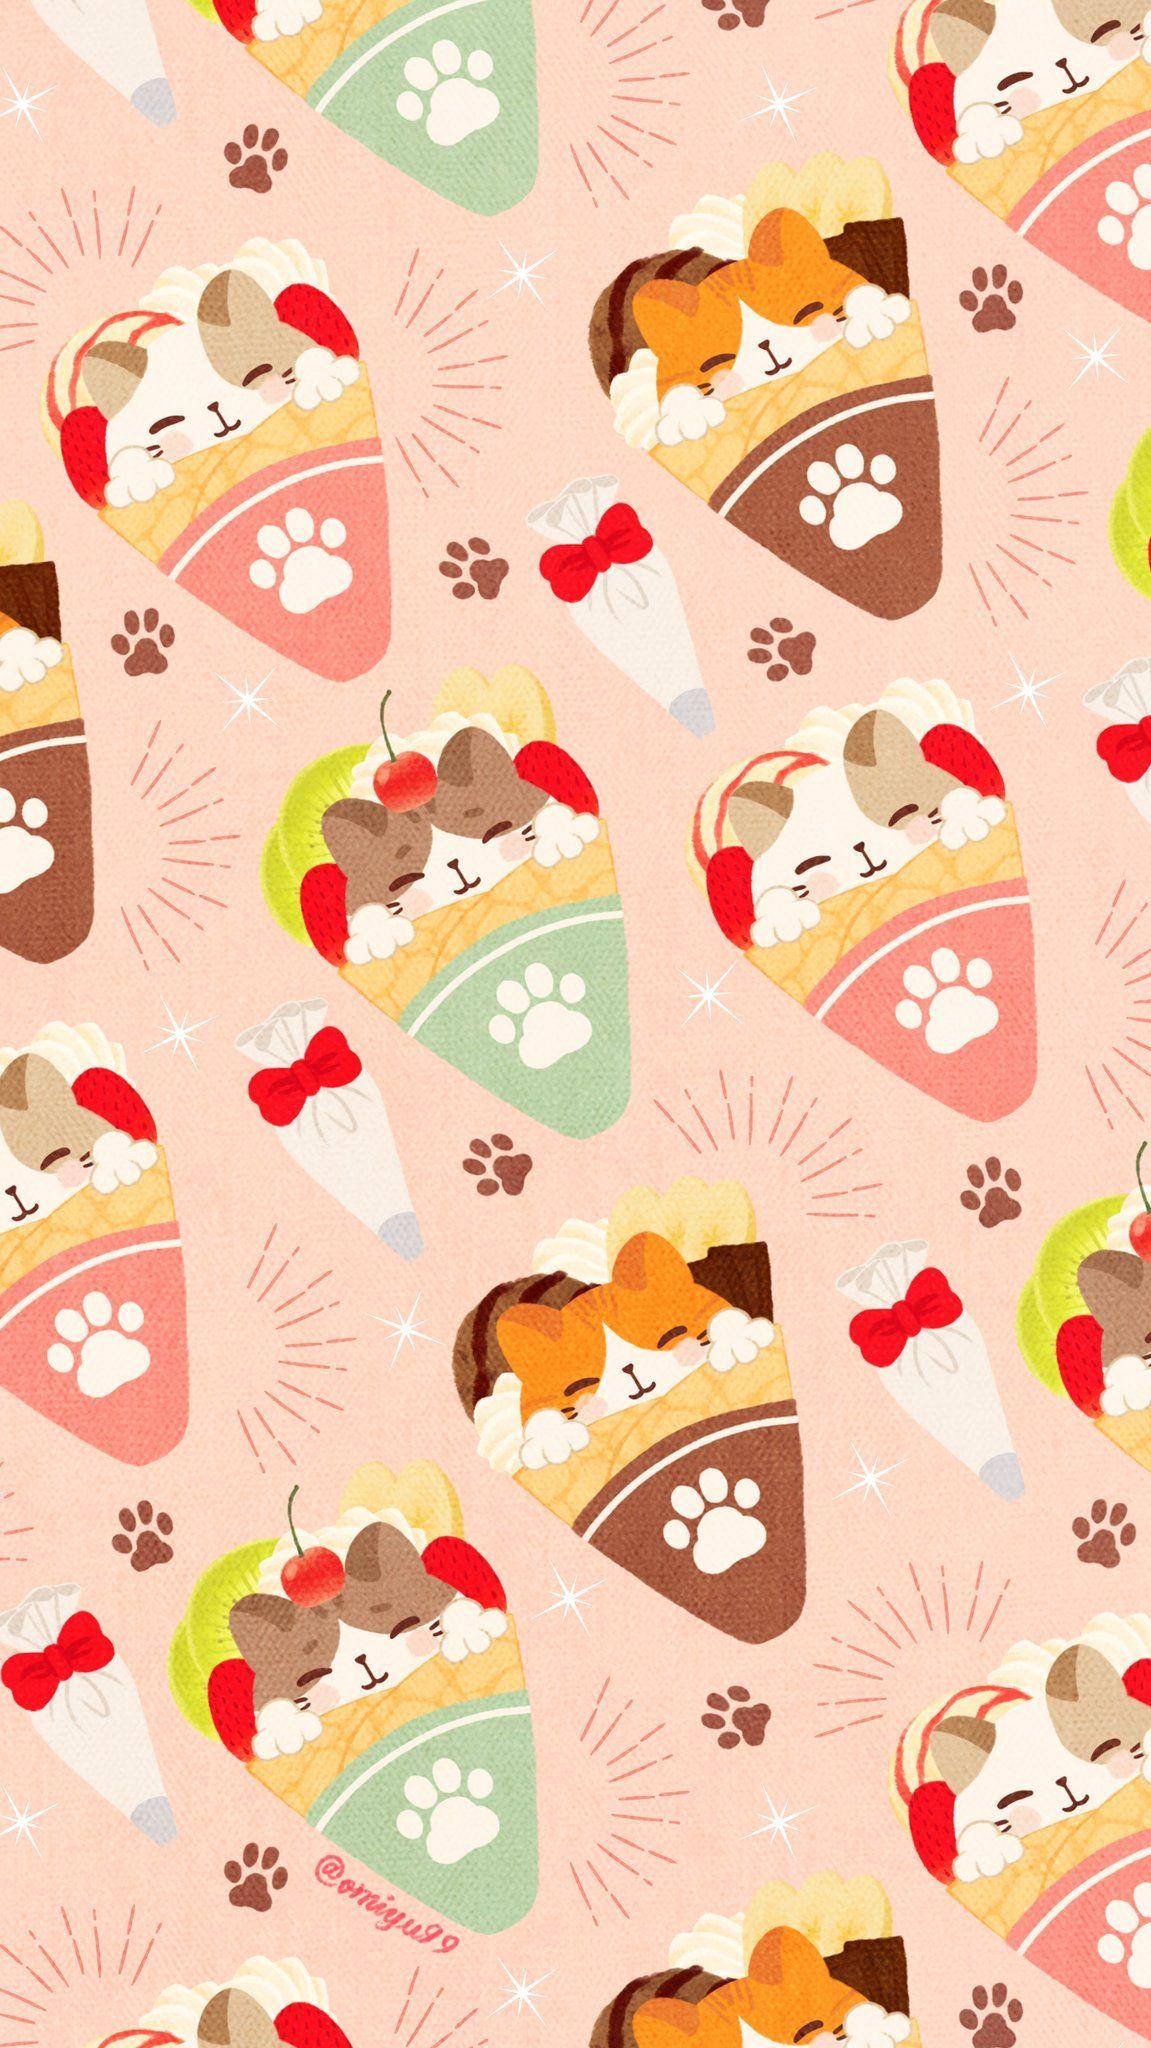 Omiyu みゆき In Kawaii Wallpaper Cute Wallpapers Cute Stickers